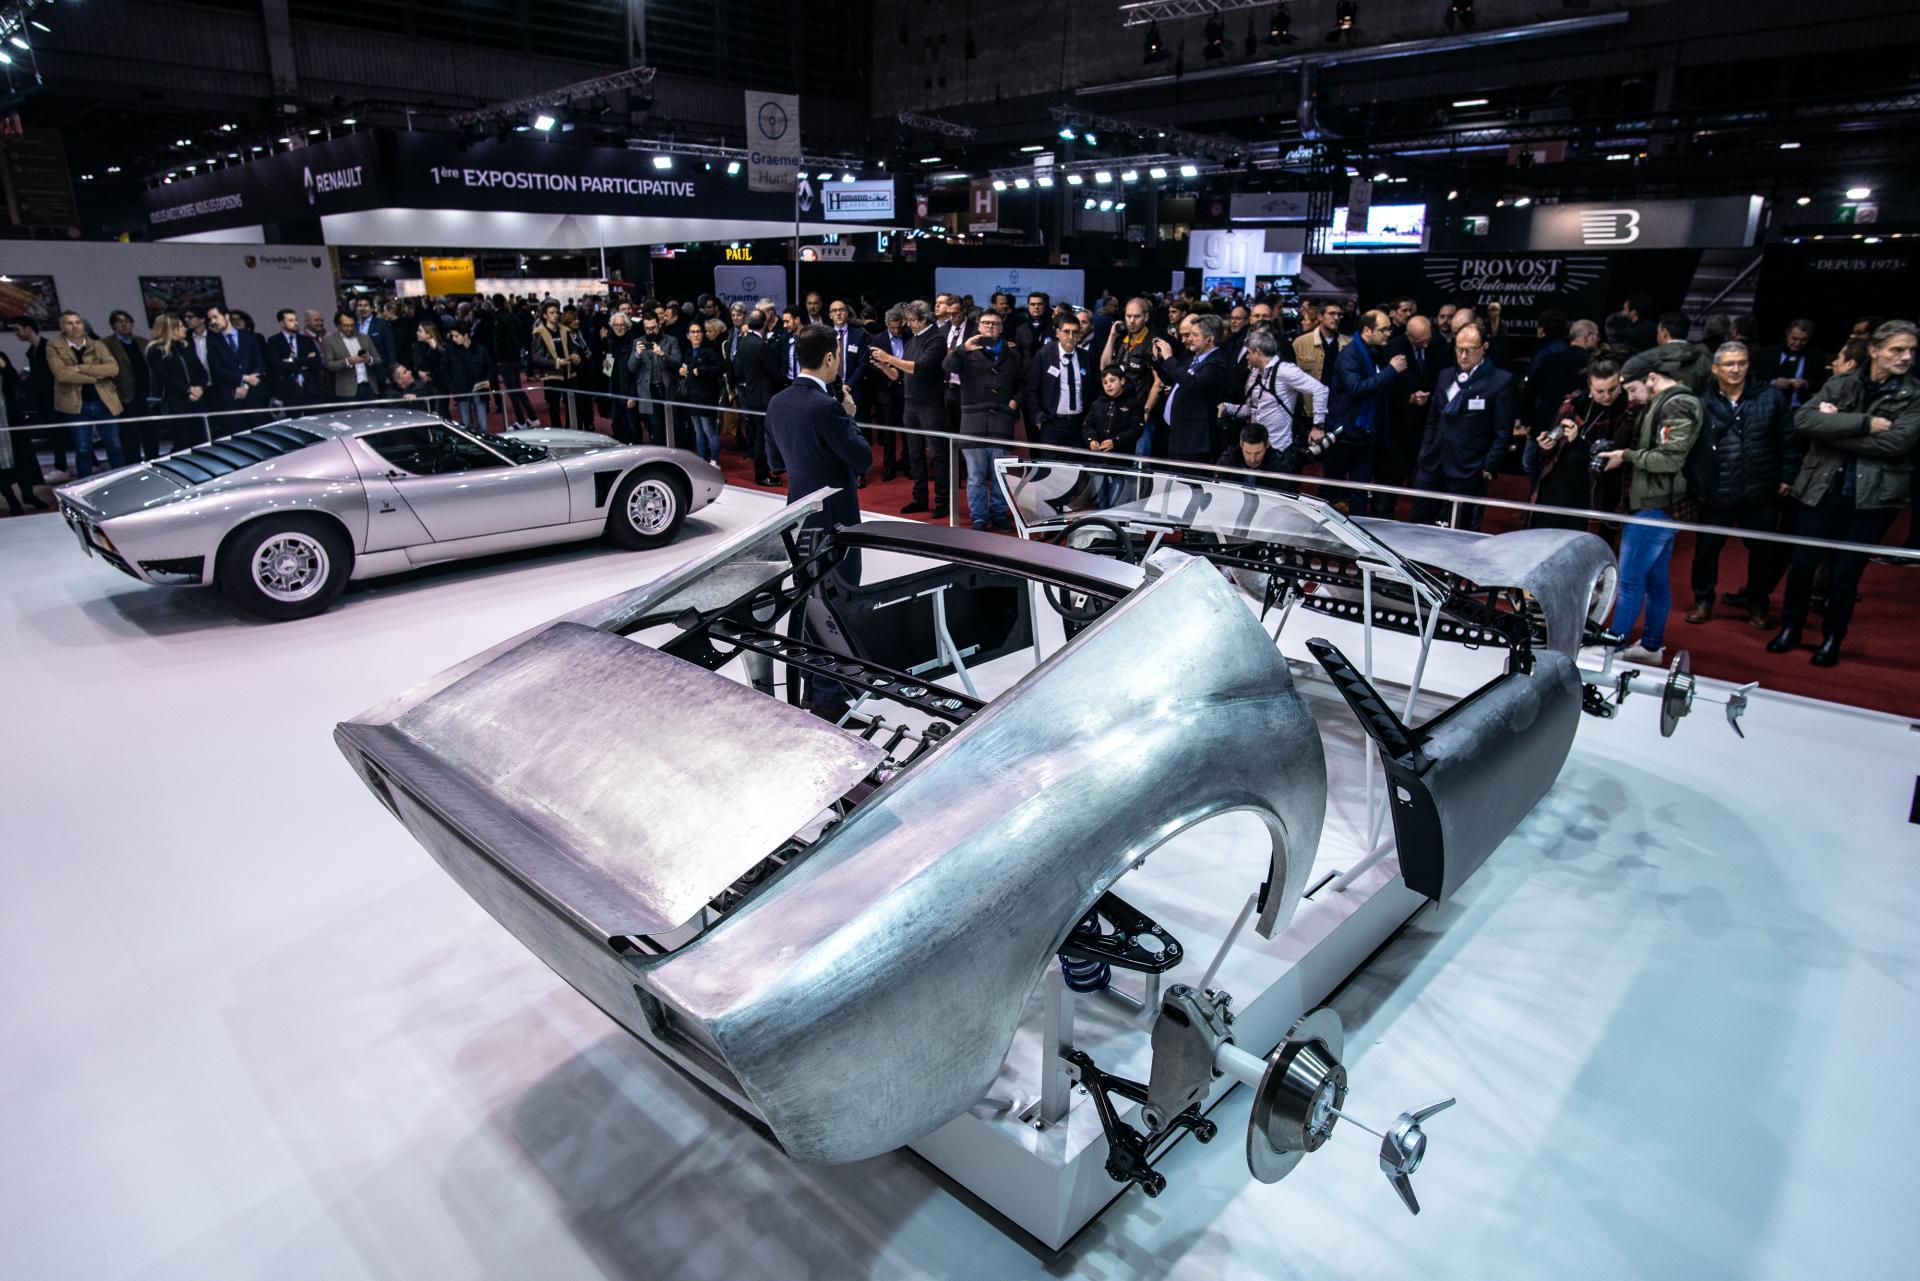 Lamborghini-Miura-SVJ-at-Retromobile-2020-5.jpg